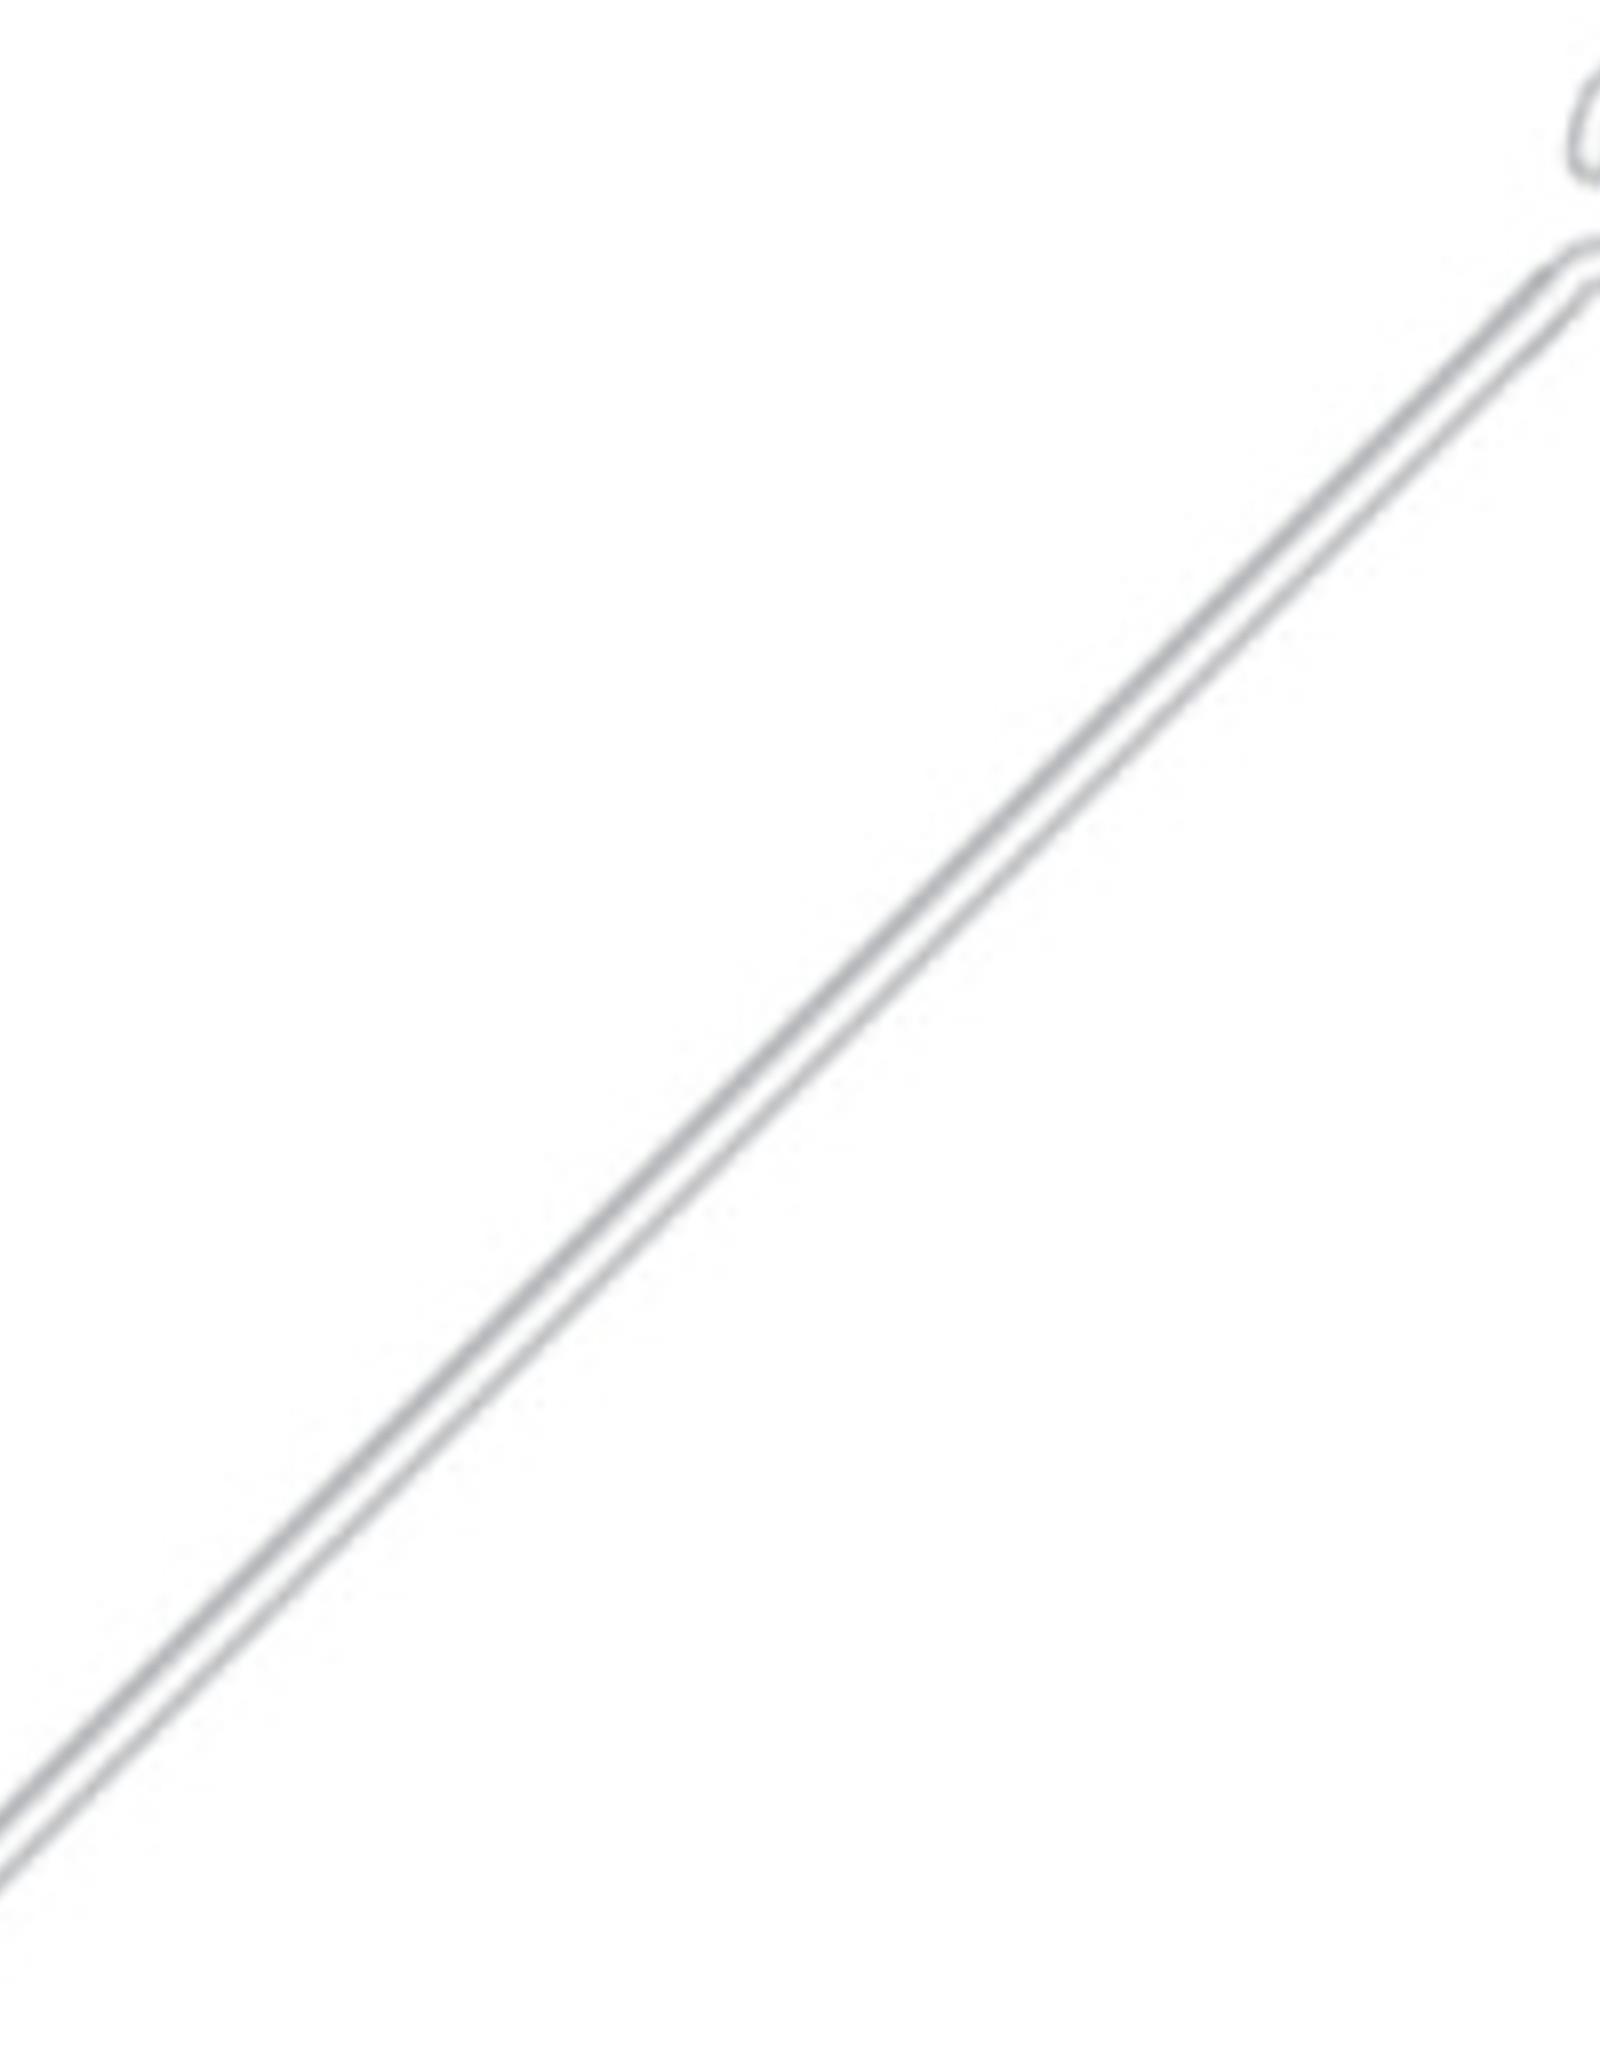 Eye Pins (500 pieces) Rhodium 1 Inches 24ga(.020)